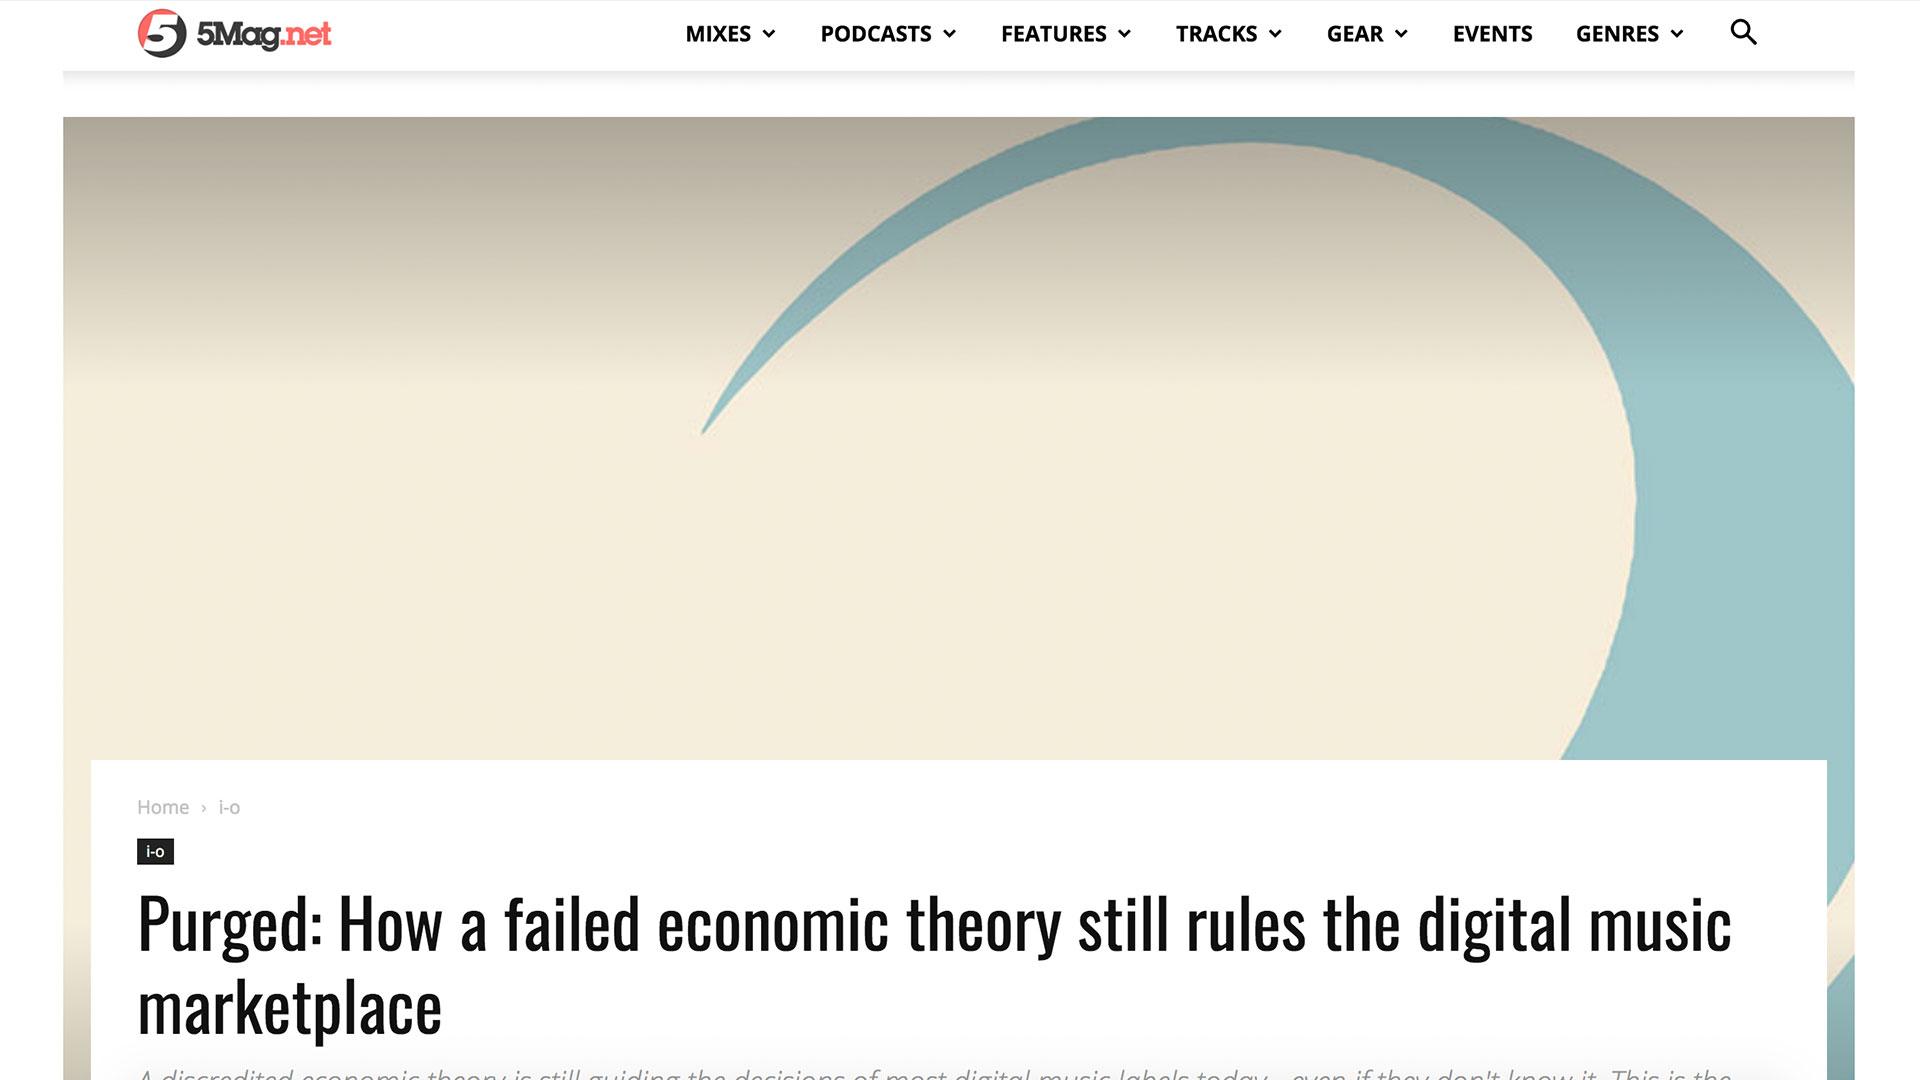 Fairness Rocks News Purged: How a failed economic theory still rules the digital music marketplace